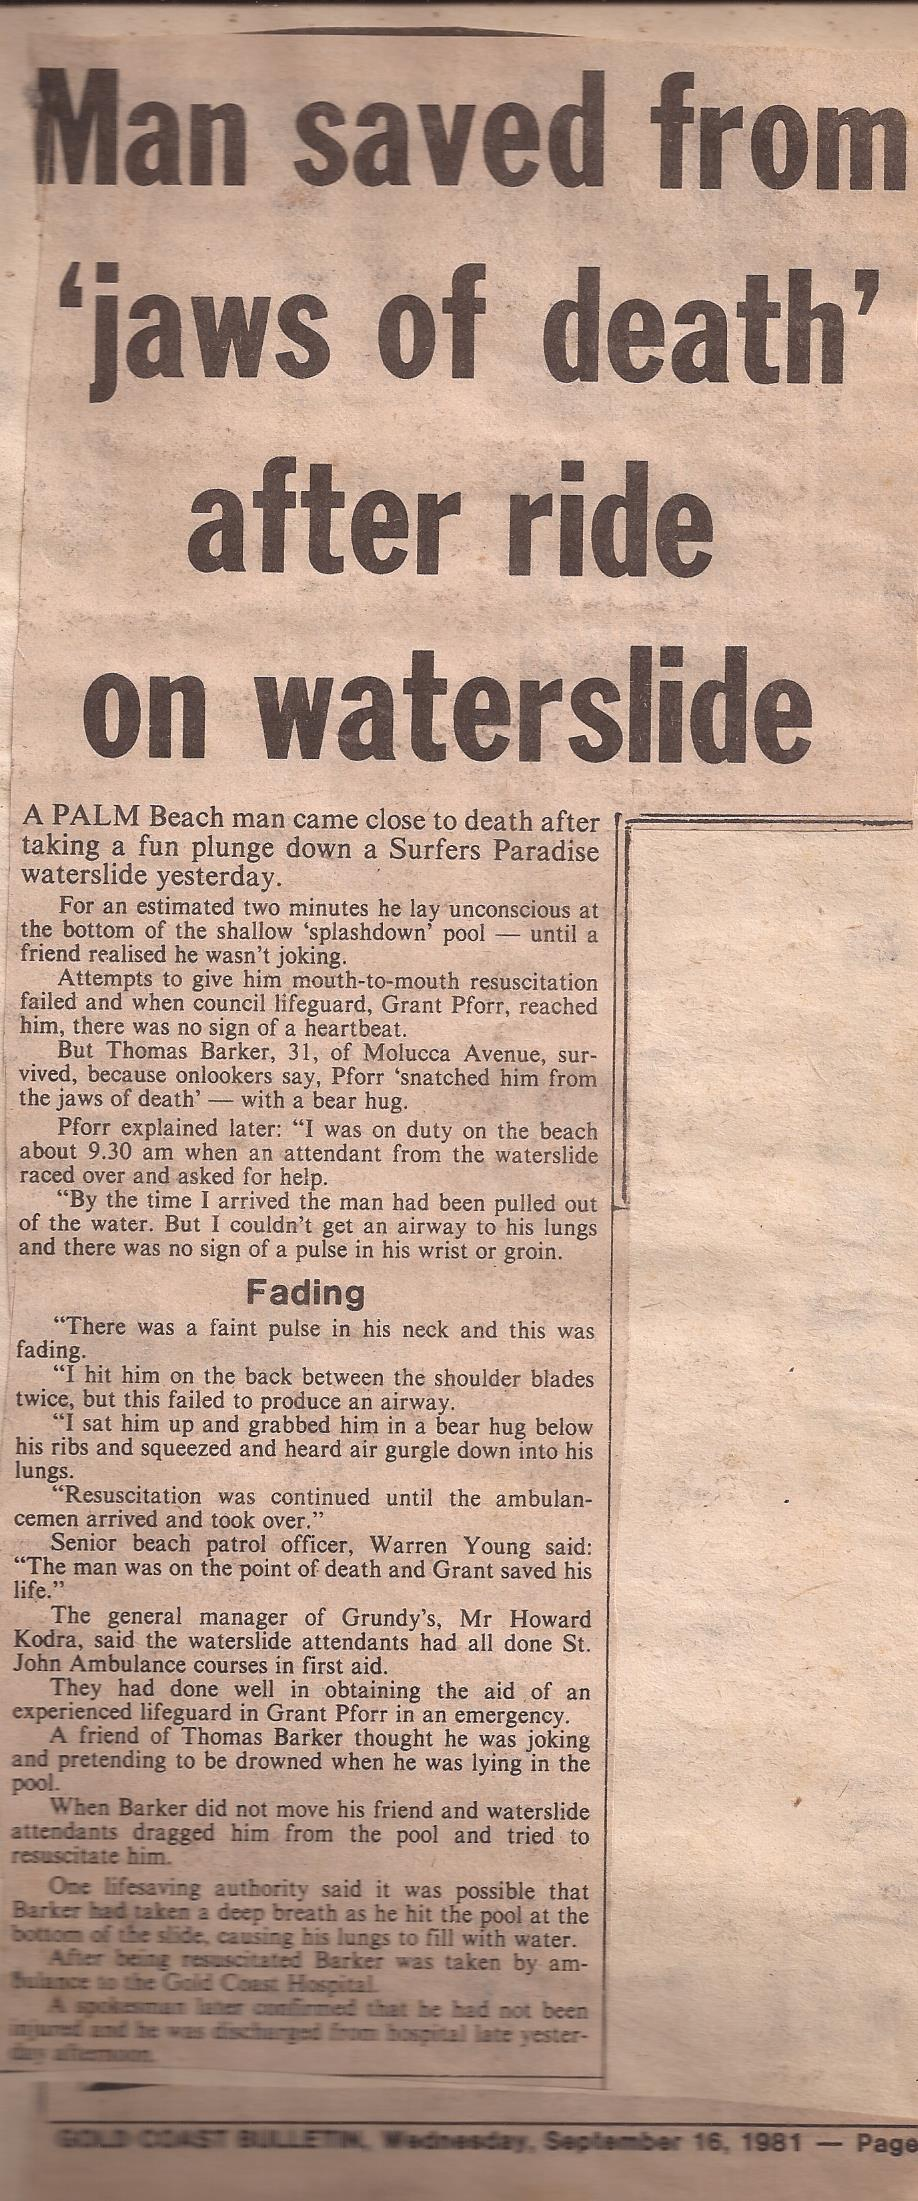 Man Saved at Waterslide (2)